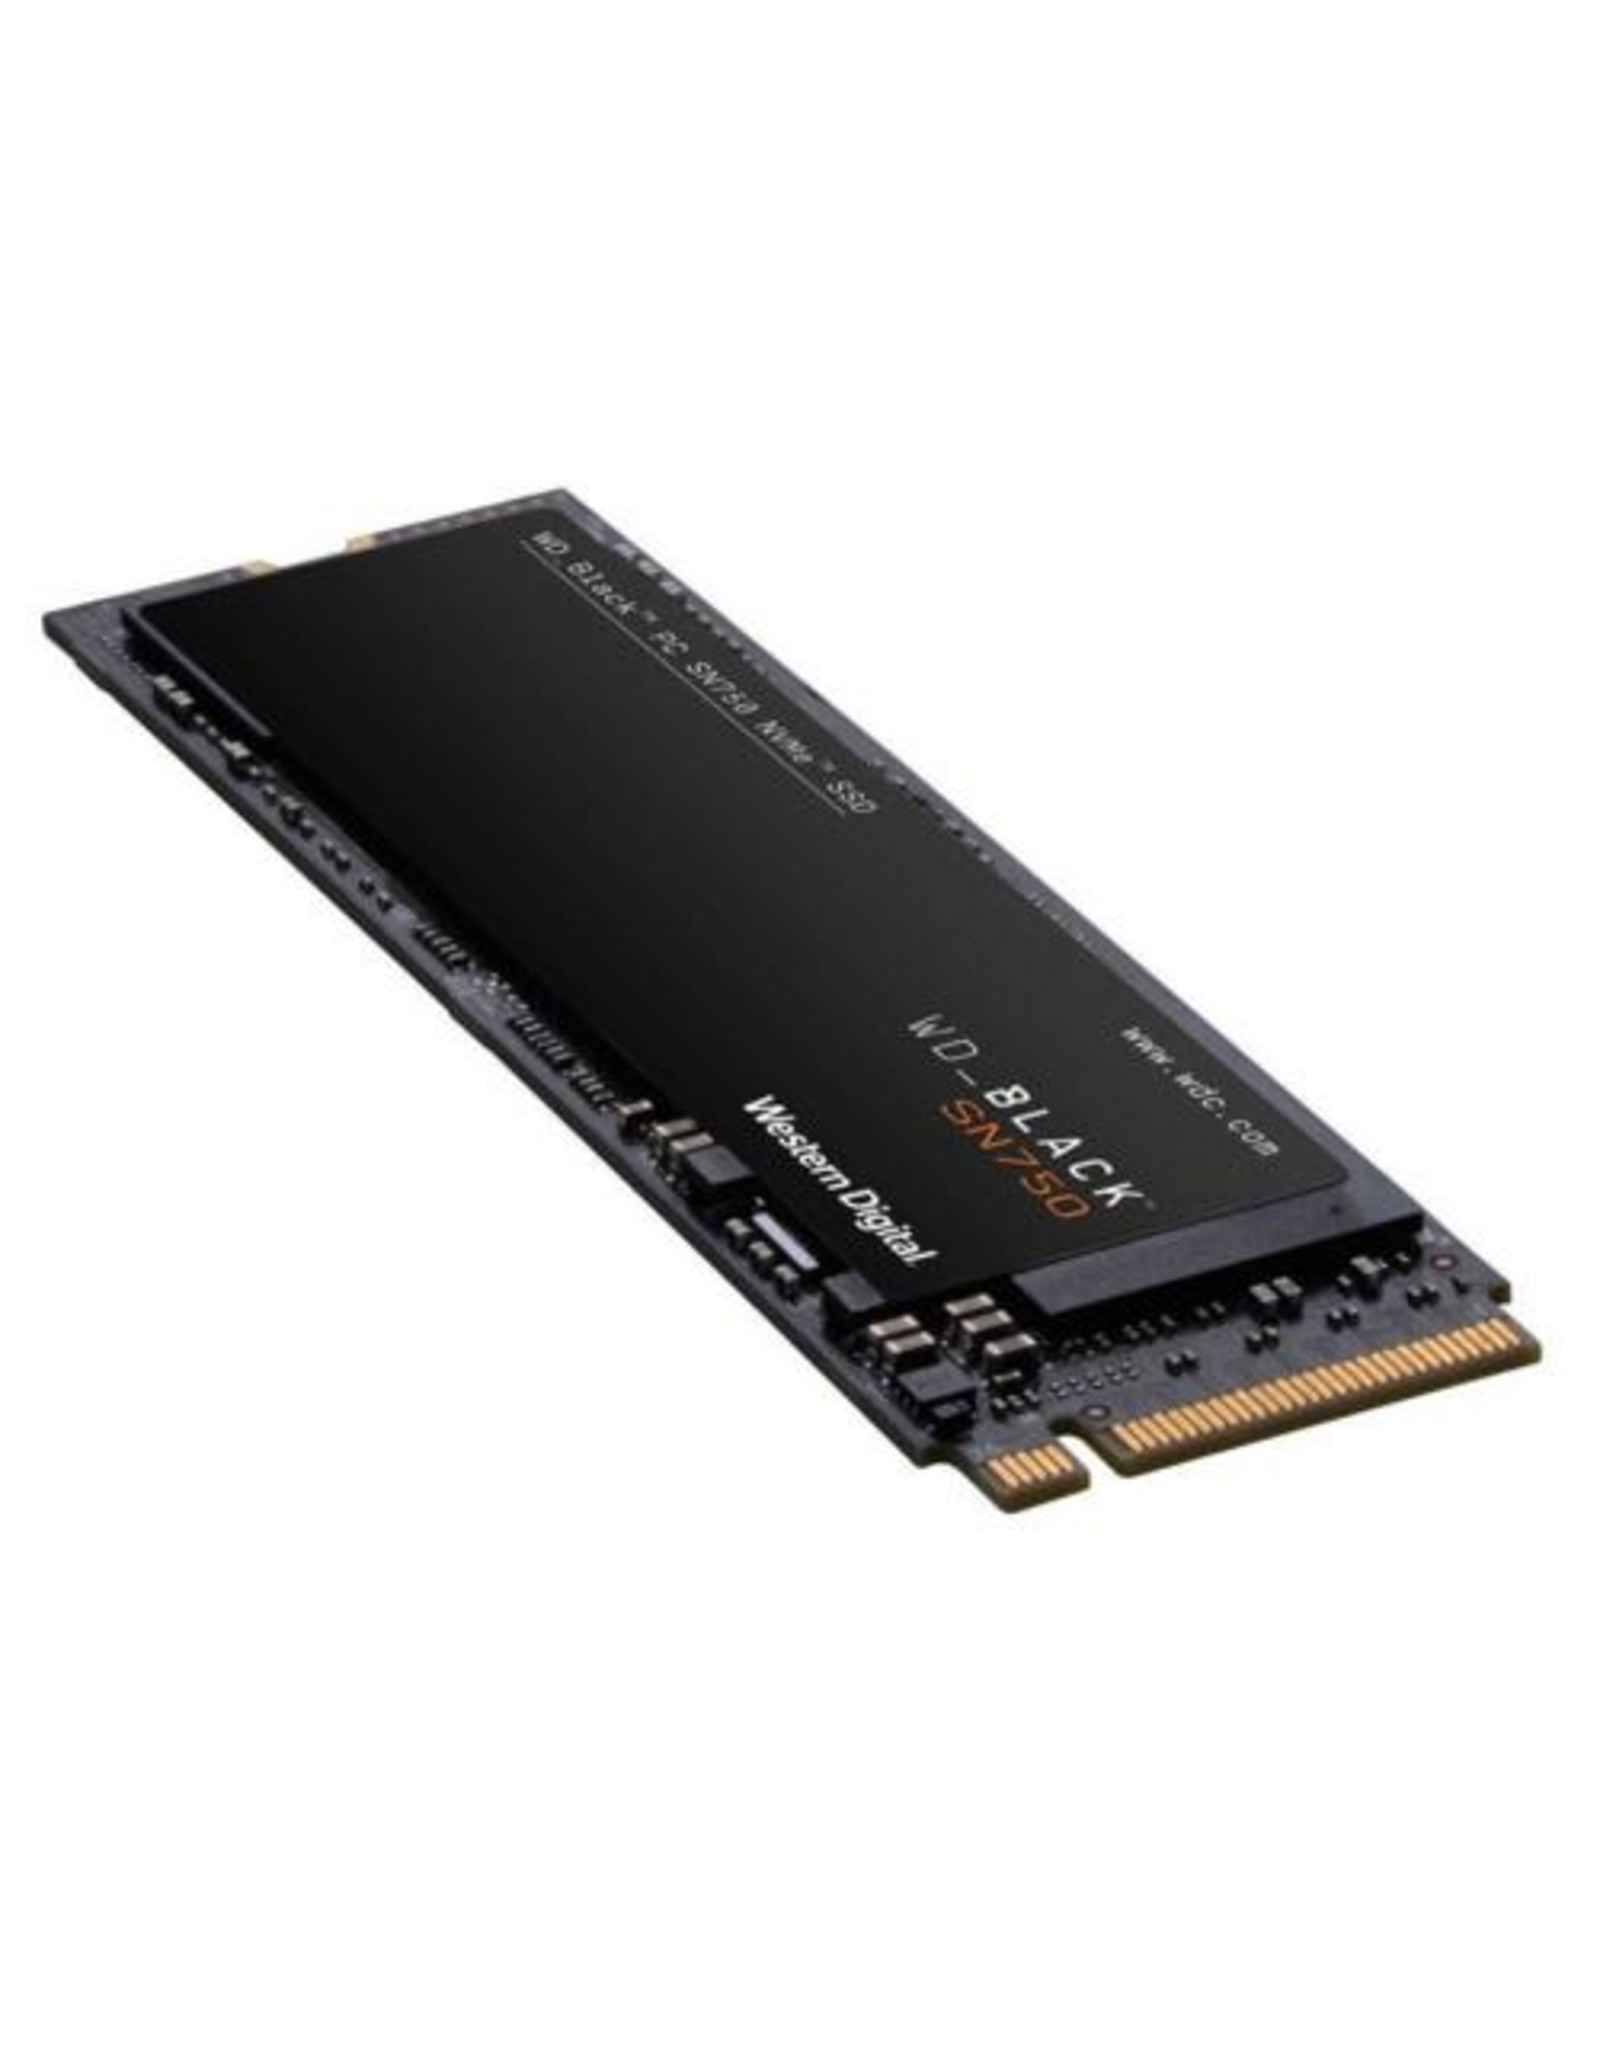 Western Digital SSD WD Black SN750 NVME m.2 500GB ( 3470MB/s read 2600MB/s)